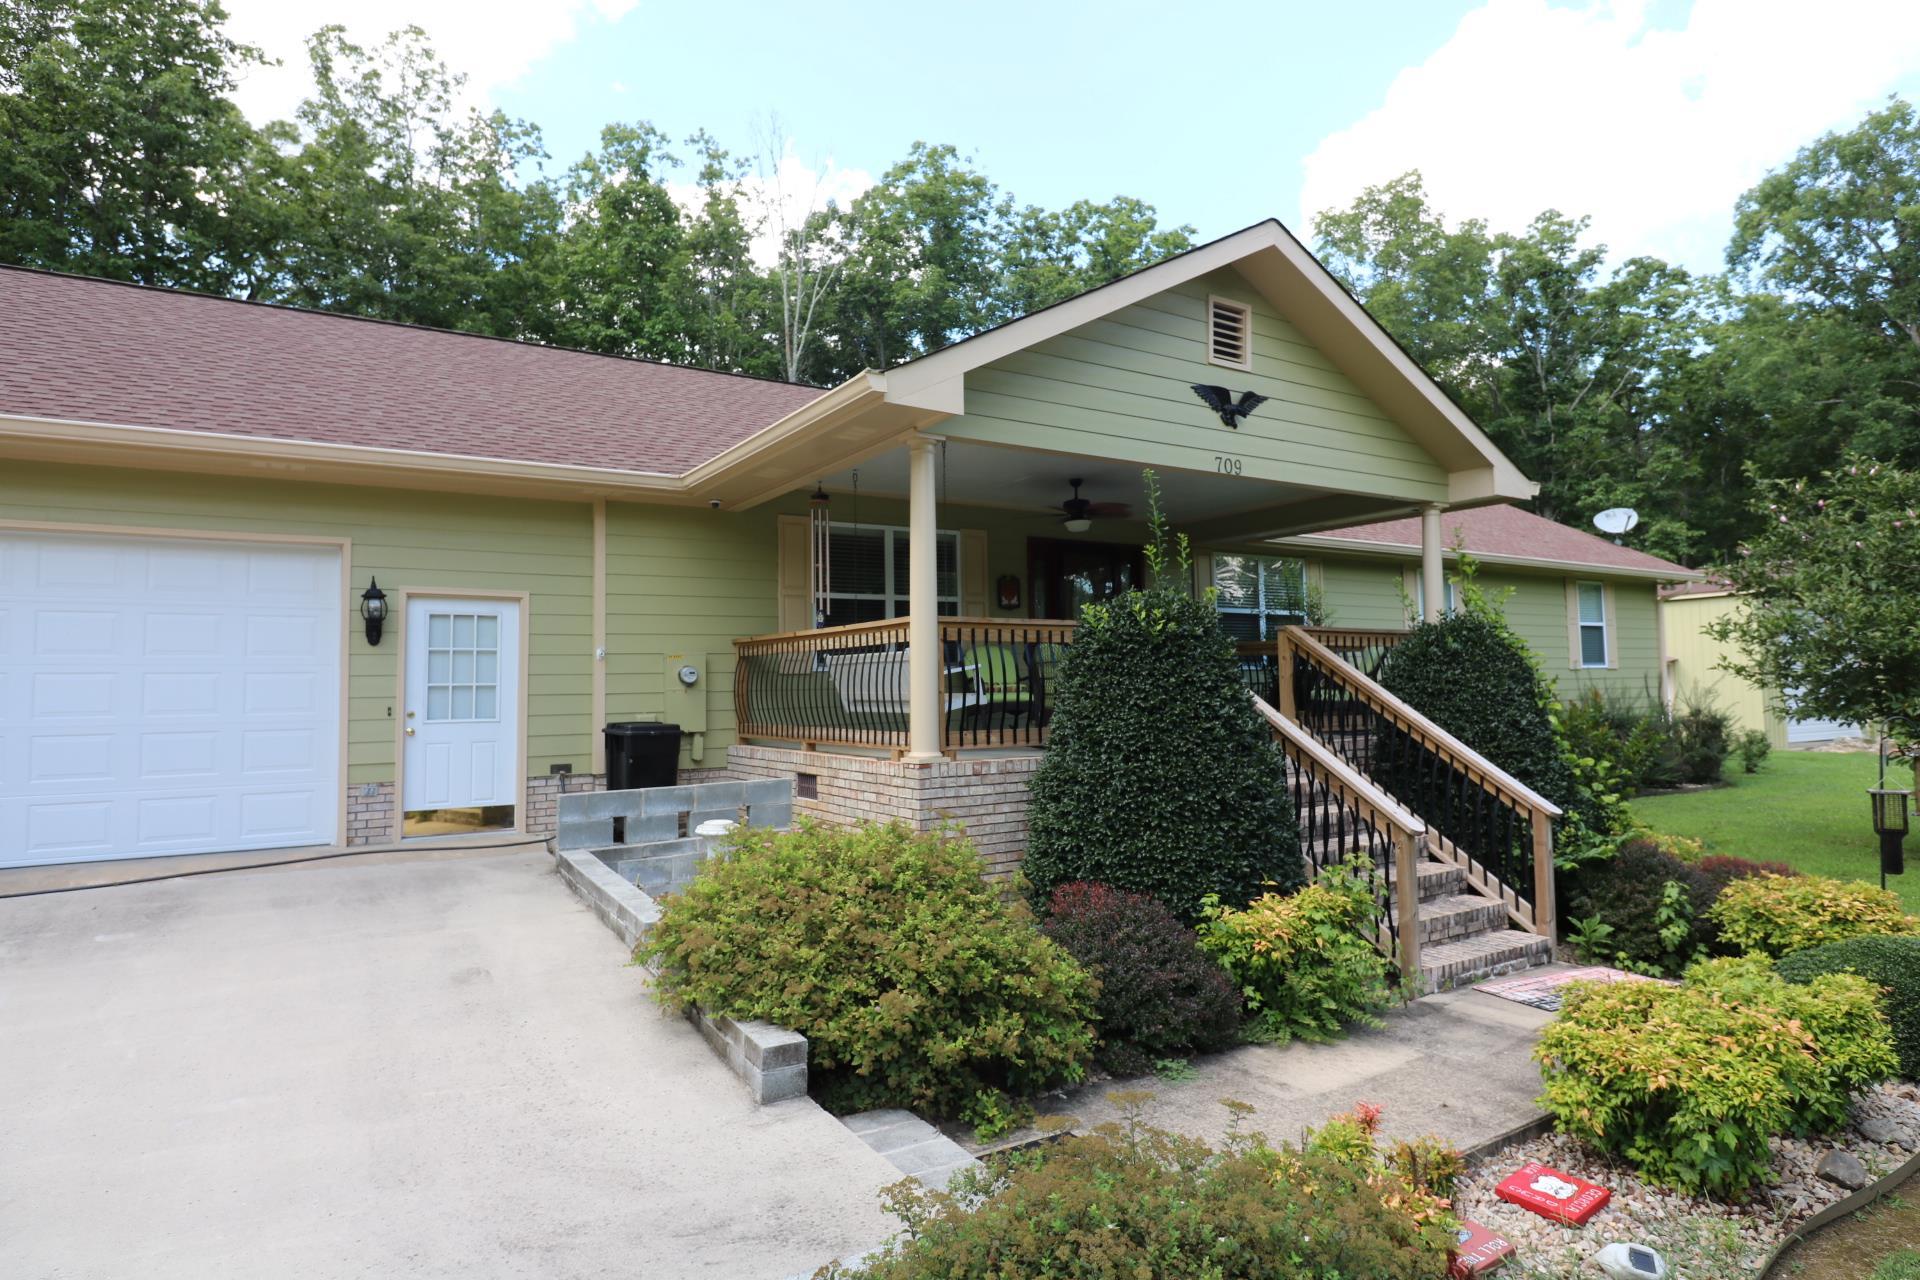 709 Elgin Dr, Monteagle, TN 37356 - Monteagle, TN real estate listing